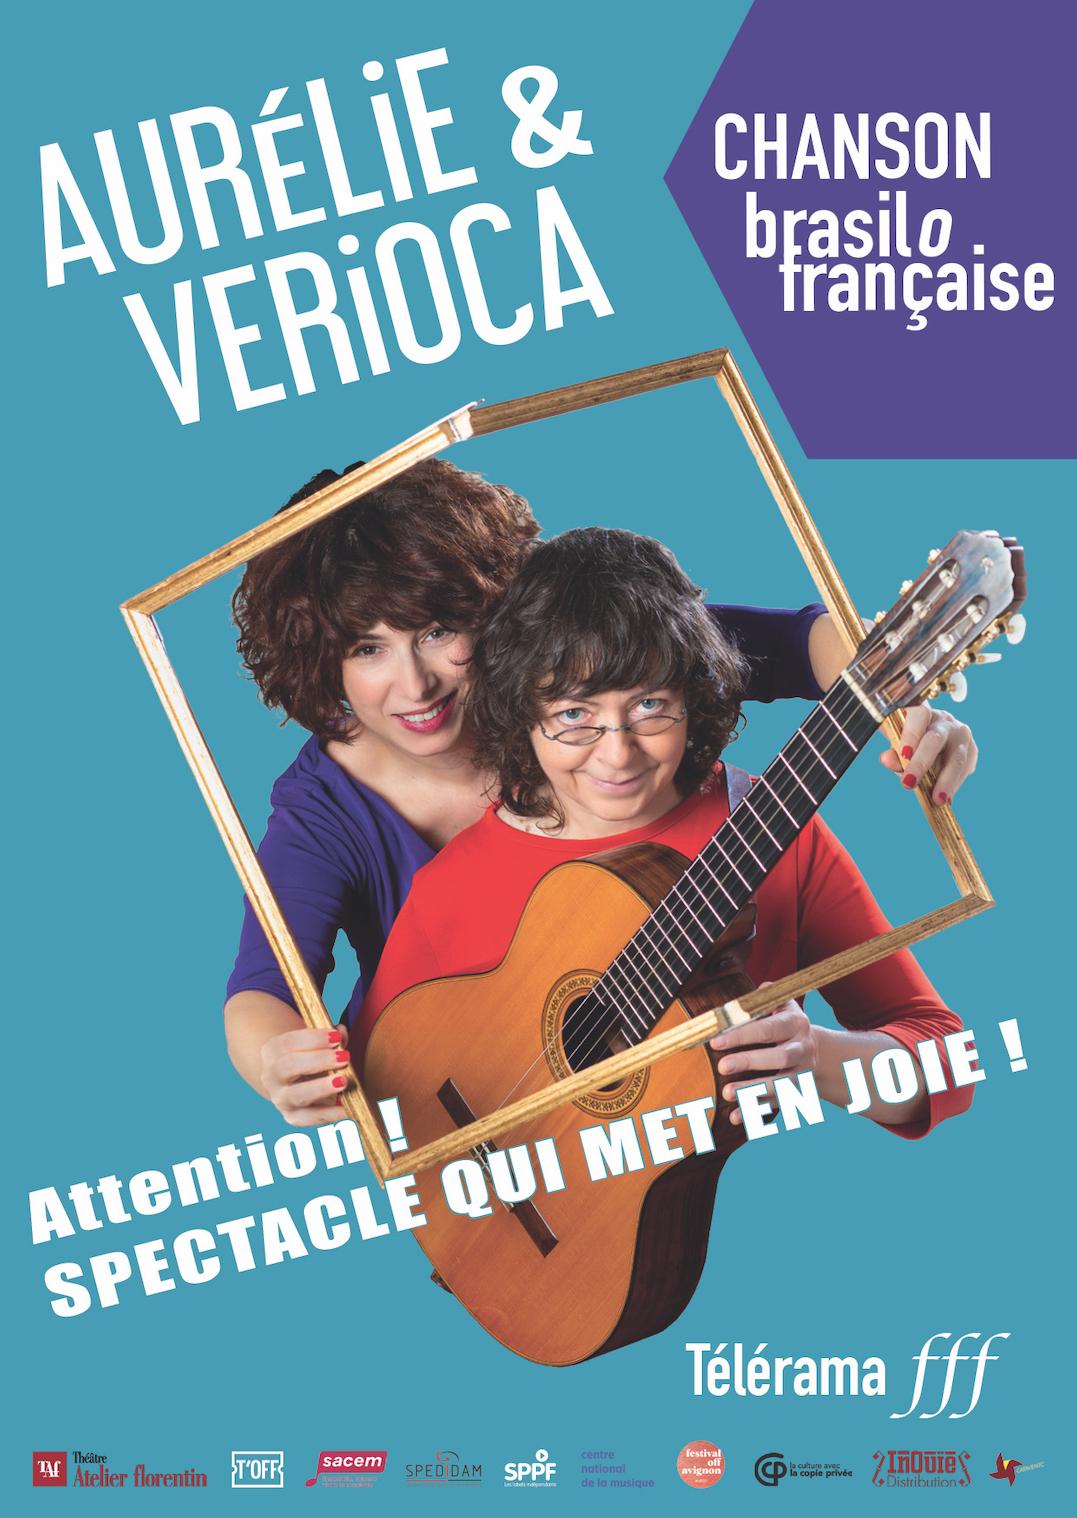 Aurélie & Verioca